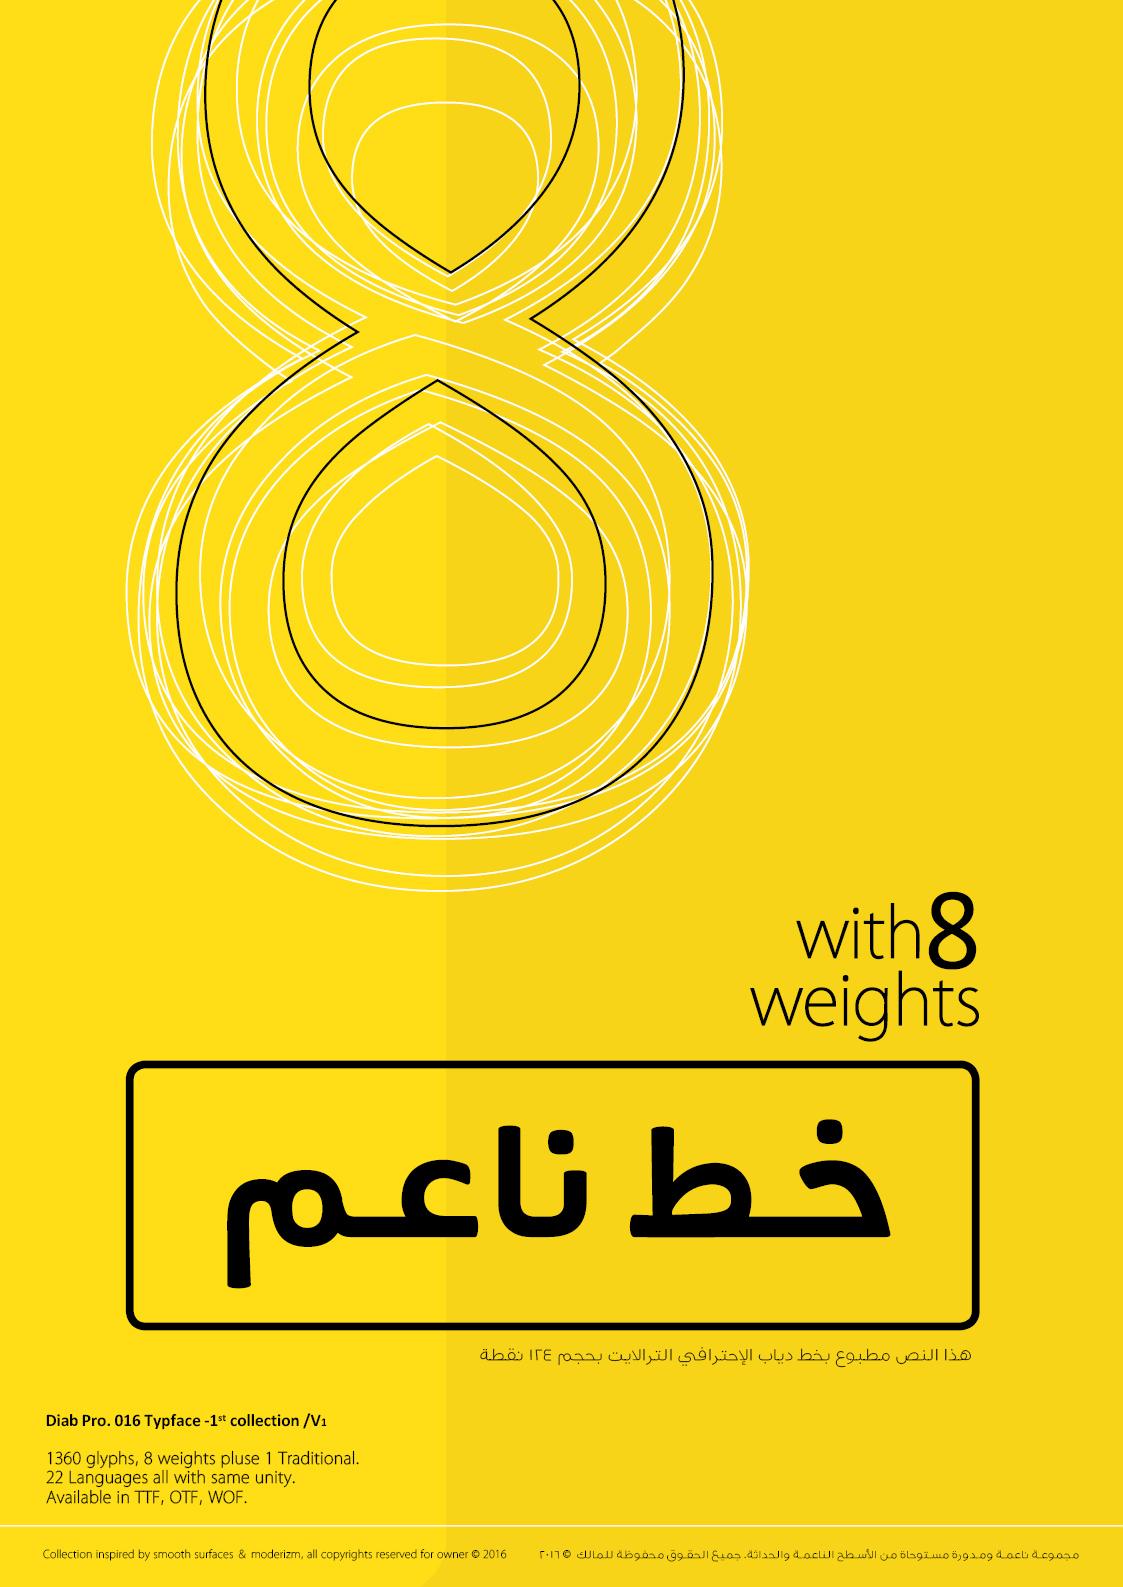 Diab Orient 2016 Best Arabic Typeface Ever